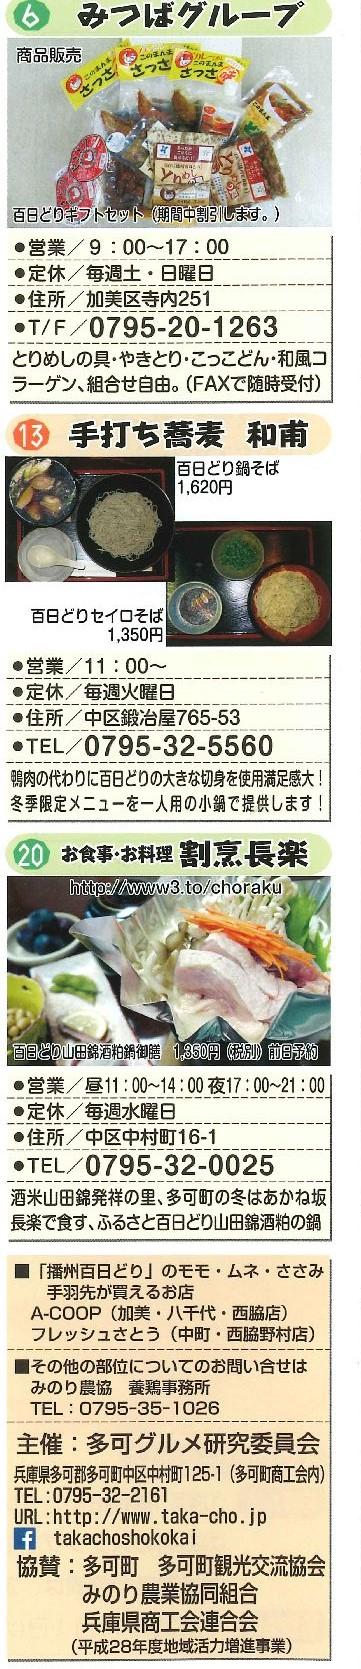 takacho-bansyu-hyakunichidori-gourmet-fair-2016-06